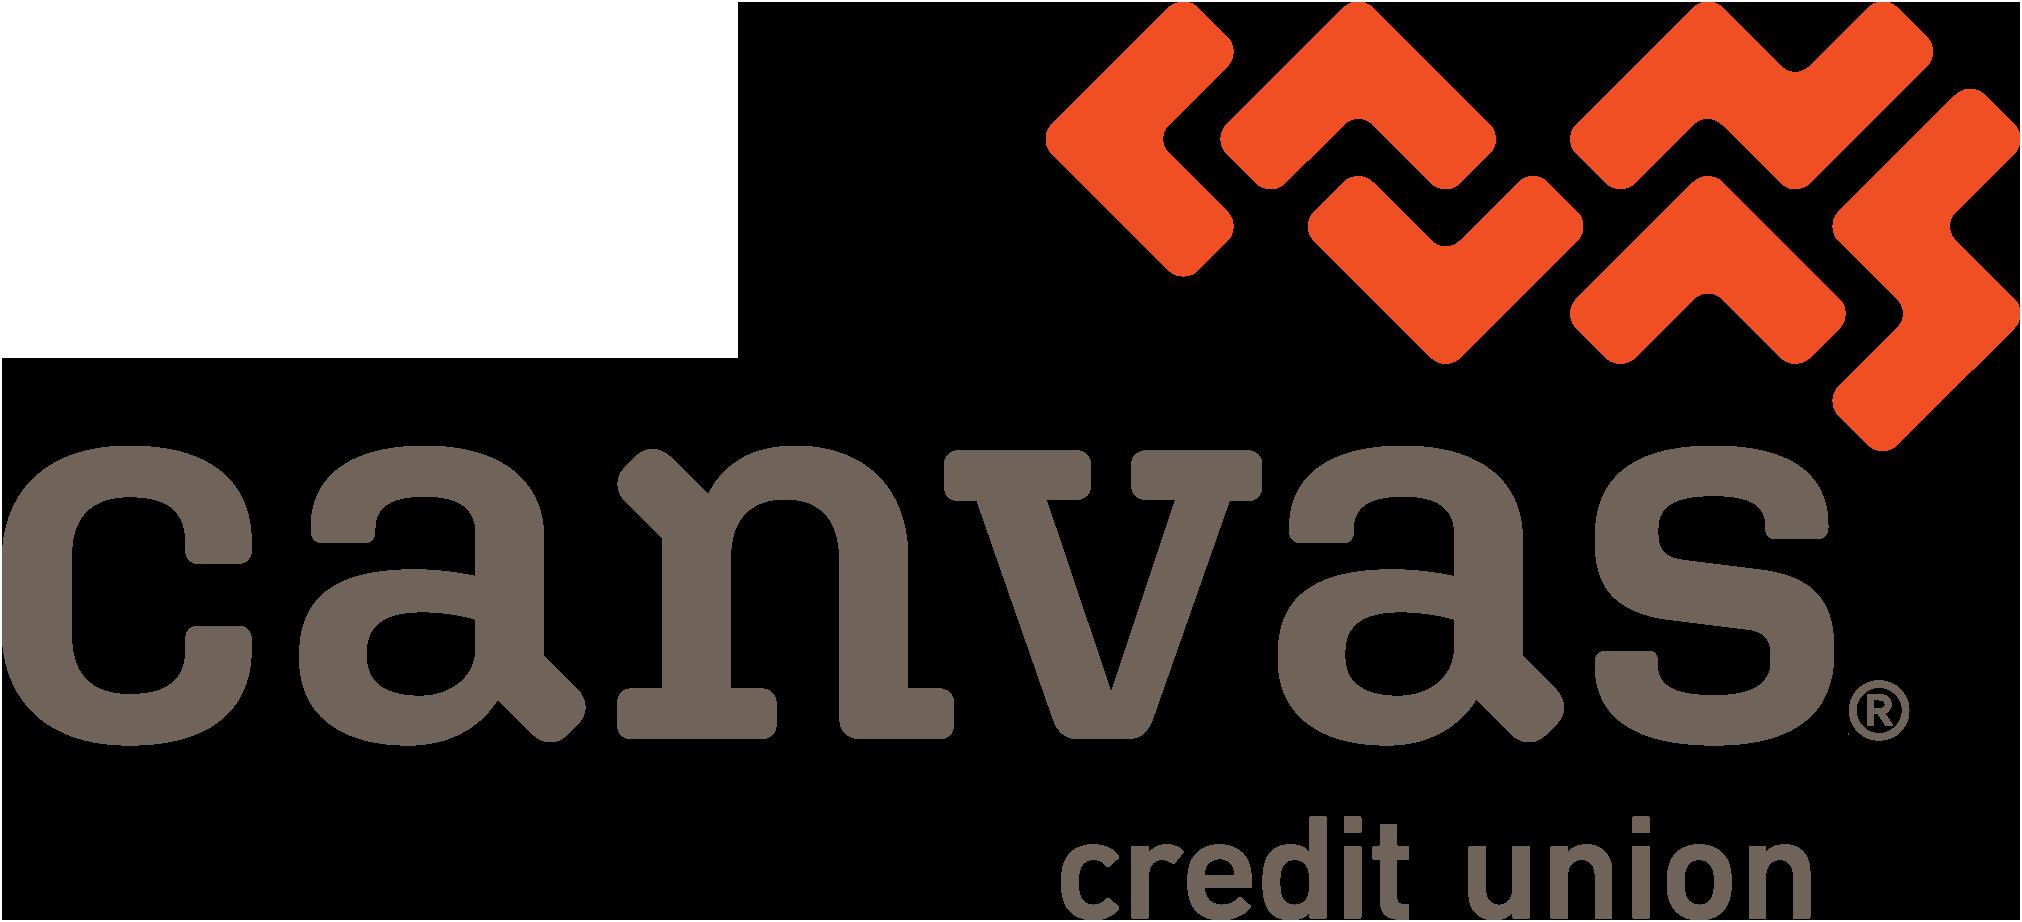 Canvas Credit Union